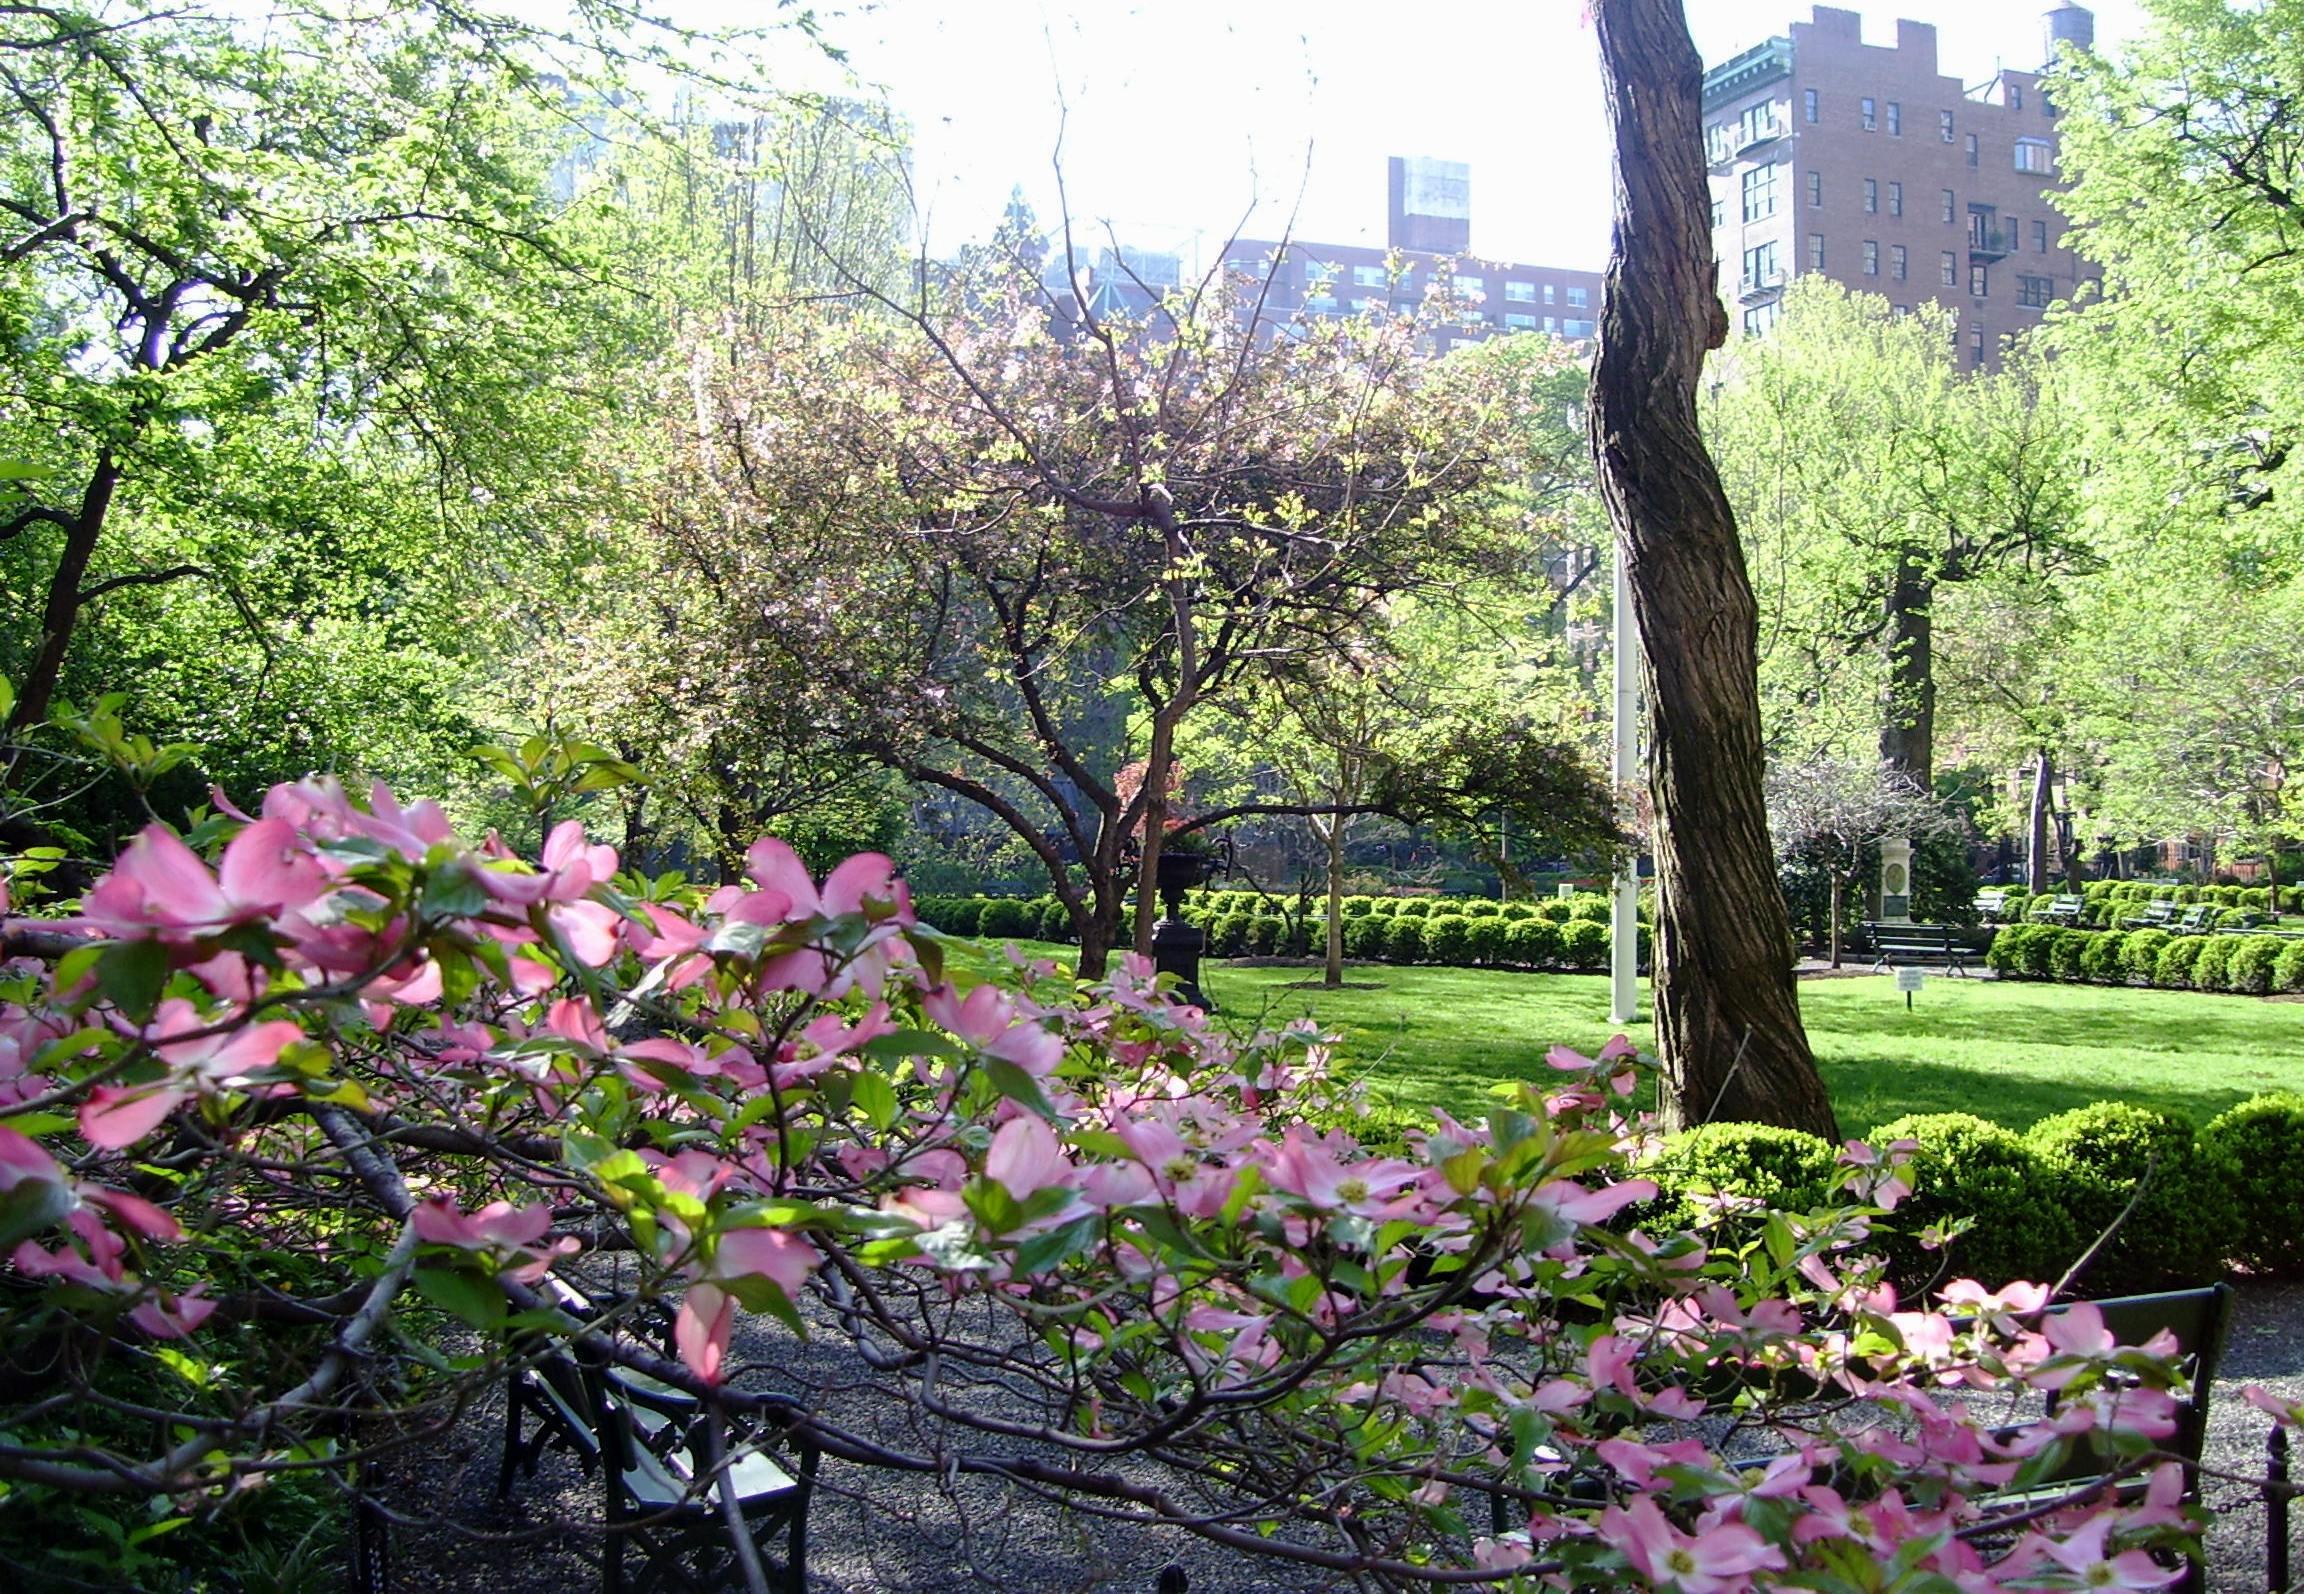 Gramercy_Park_interior_NW_corner